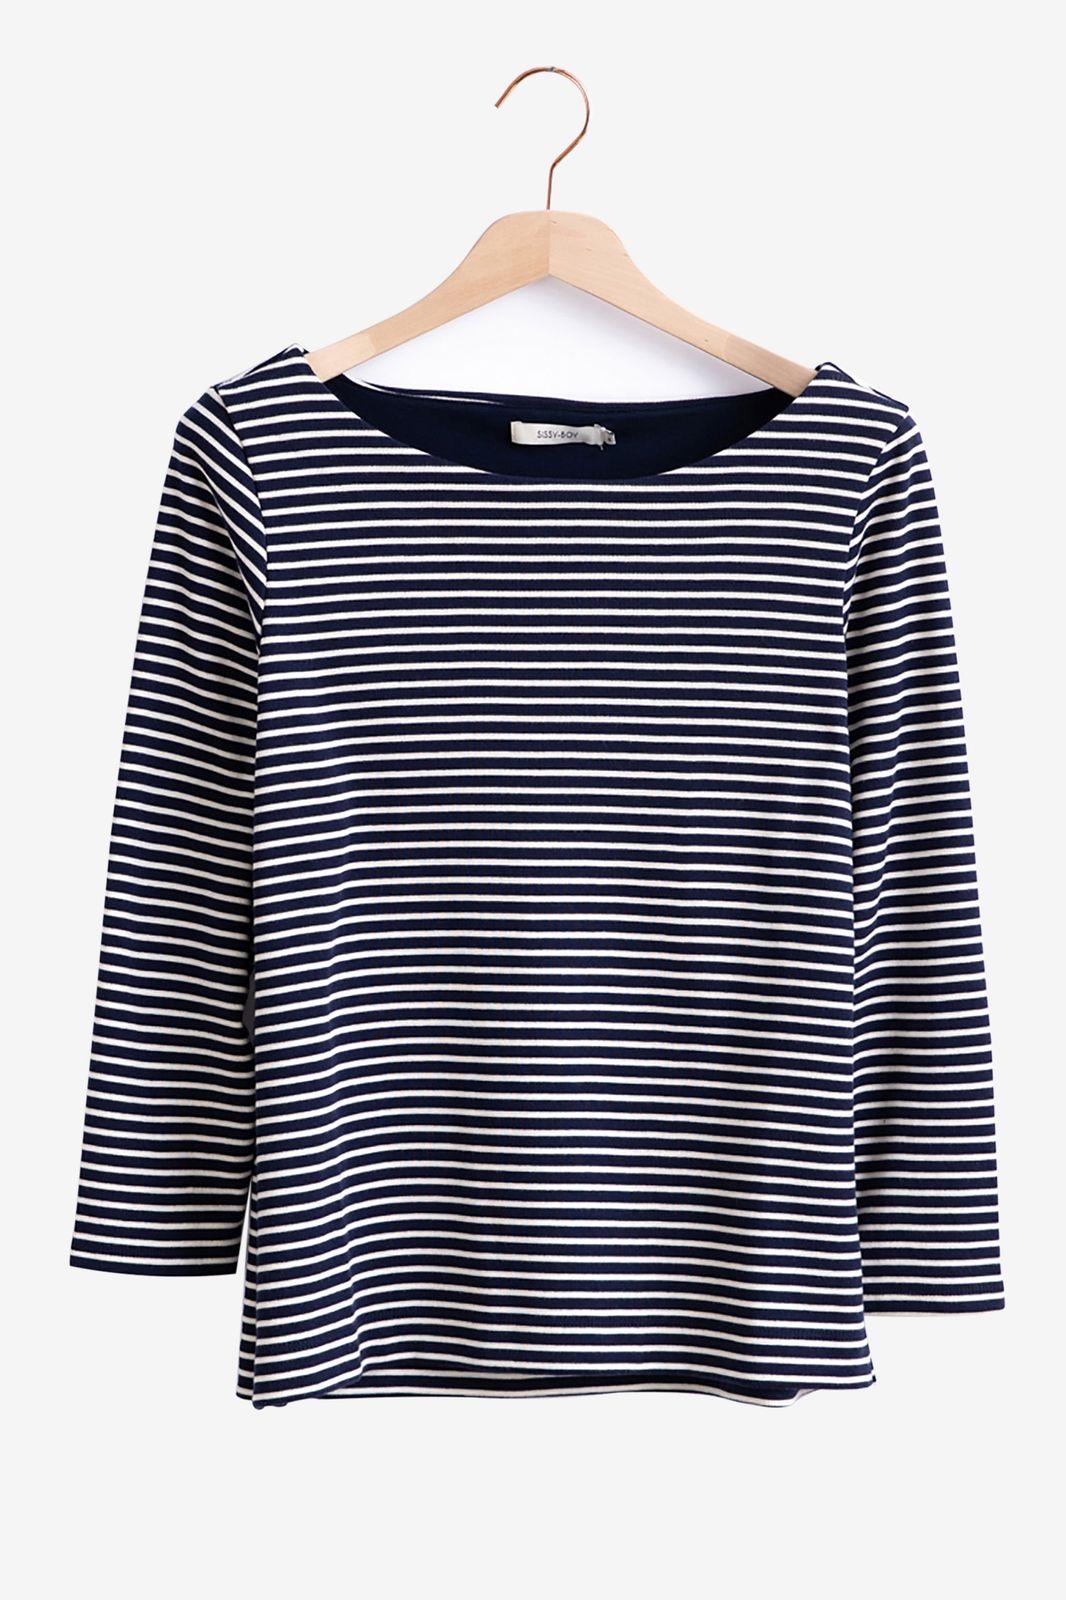 Donkerblauw gestreept t-shirt